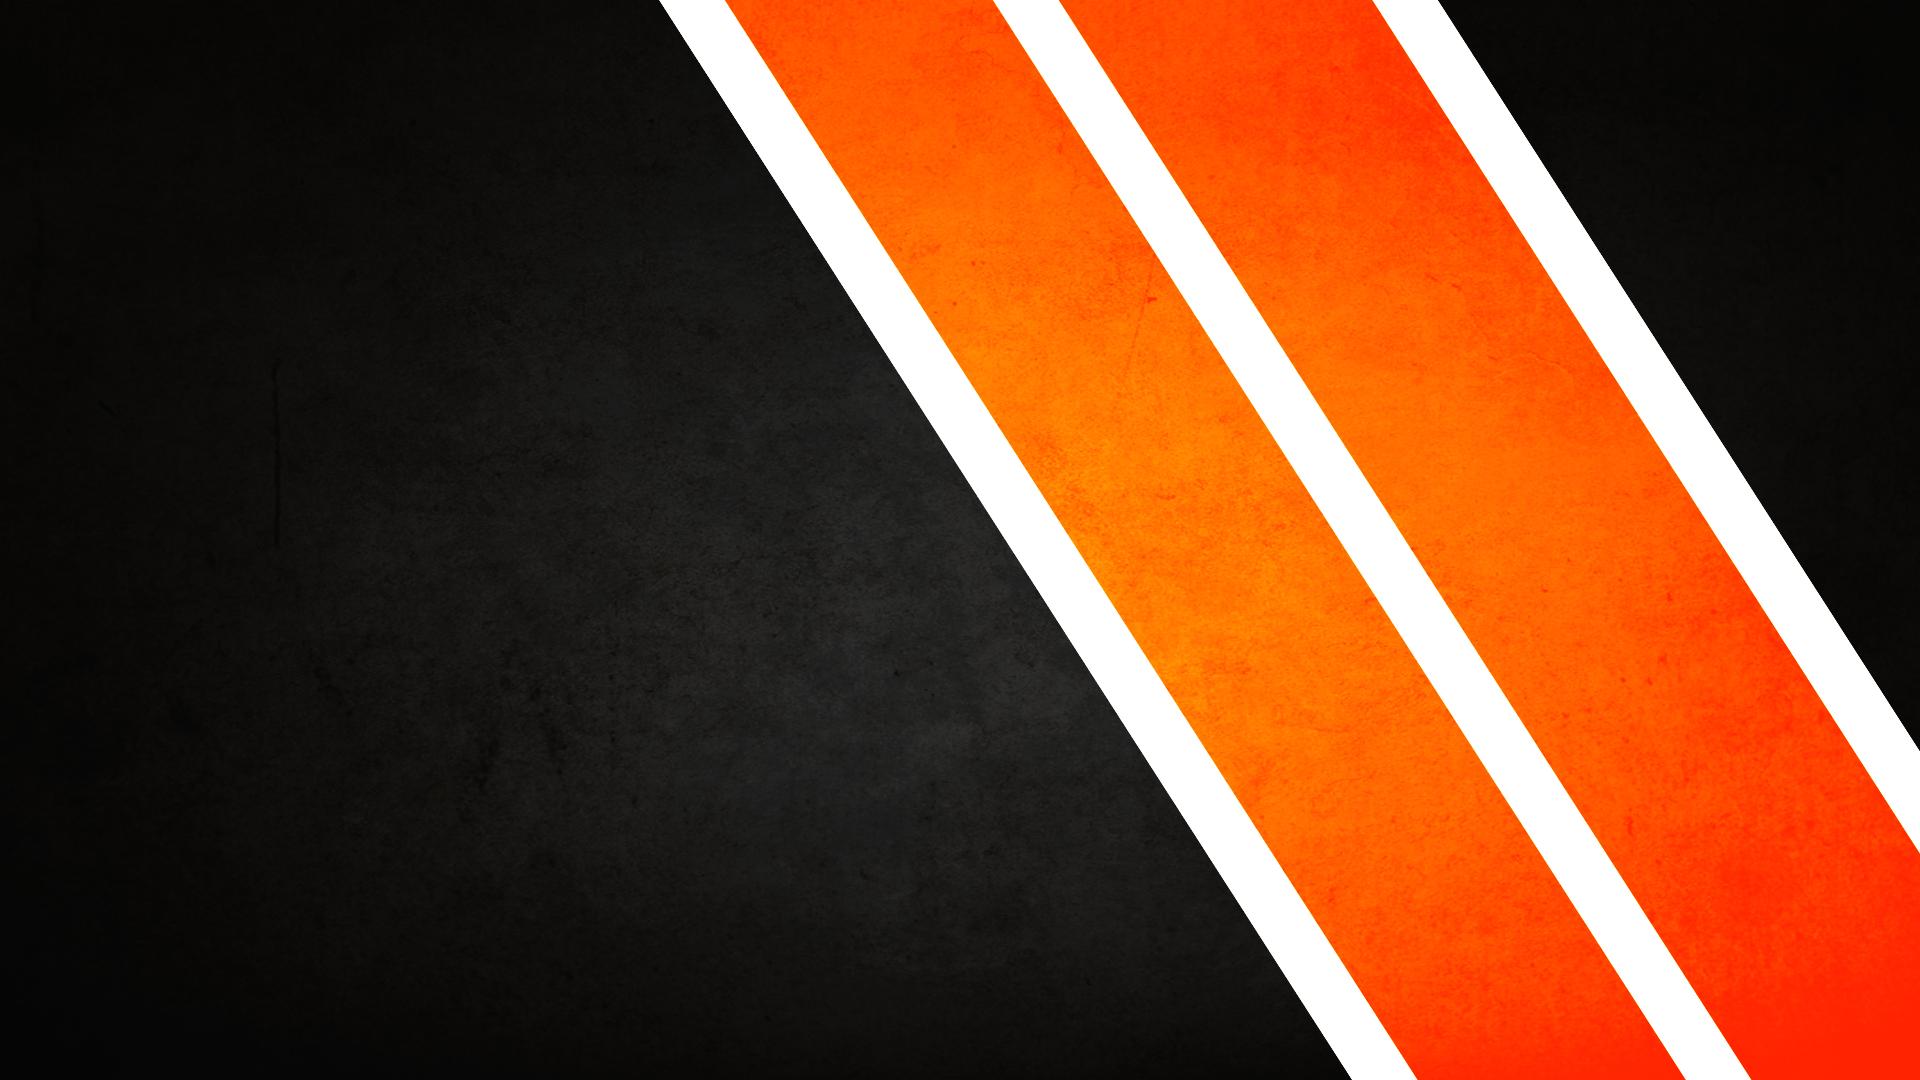 minimalistic orange stripes / 1920x1080 Wallpaper Orange